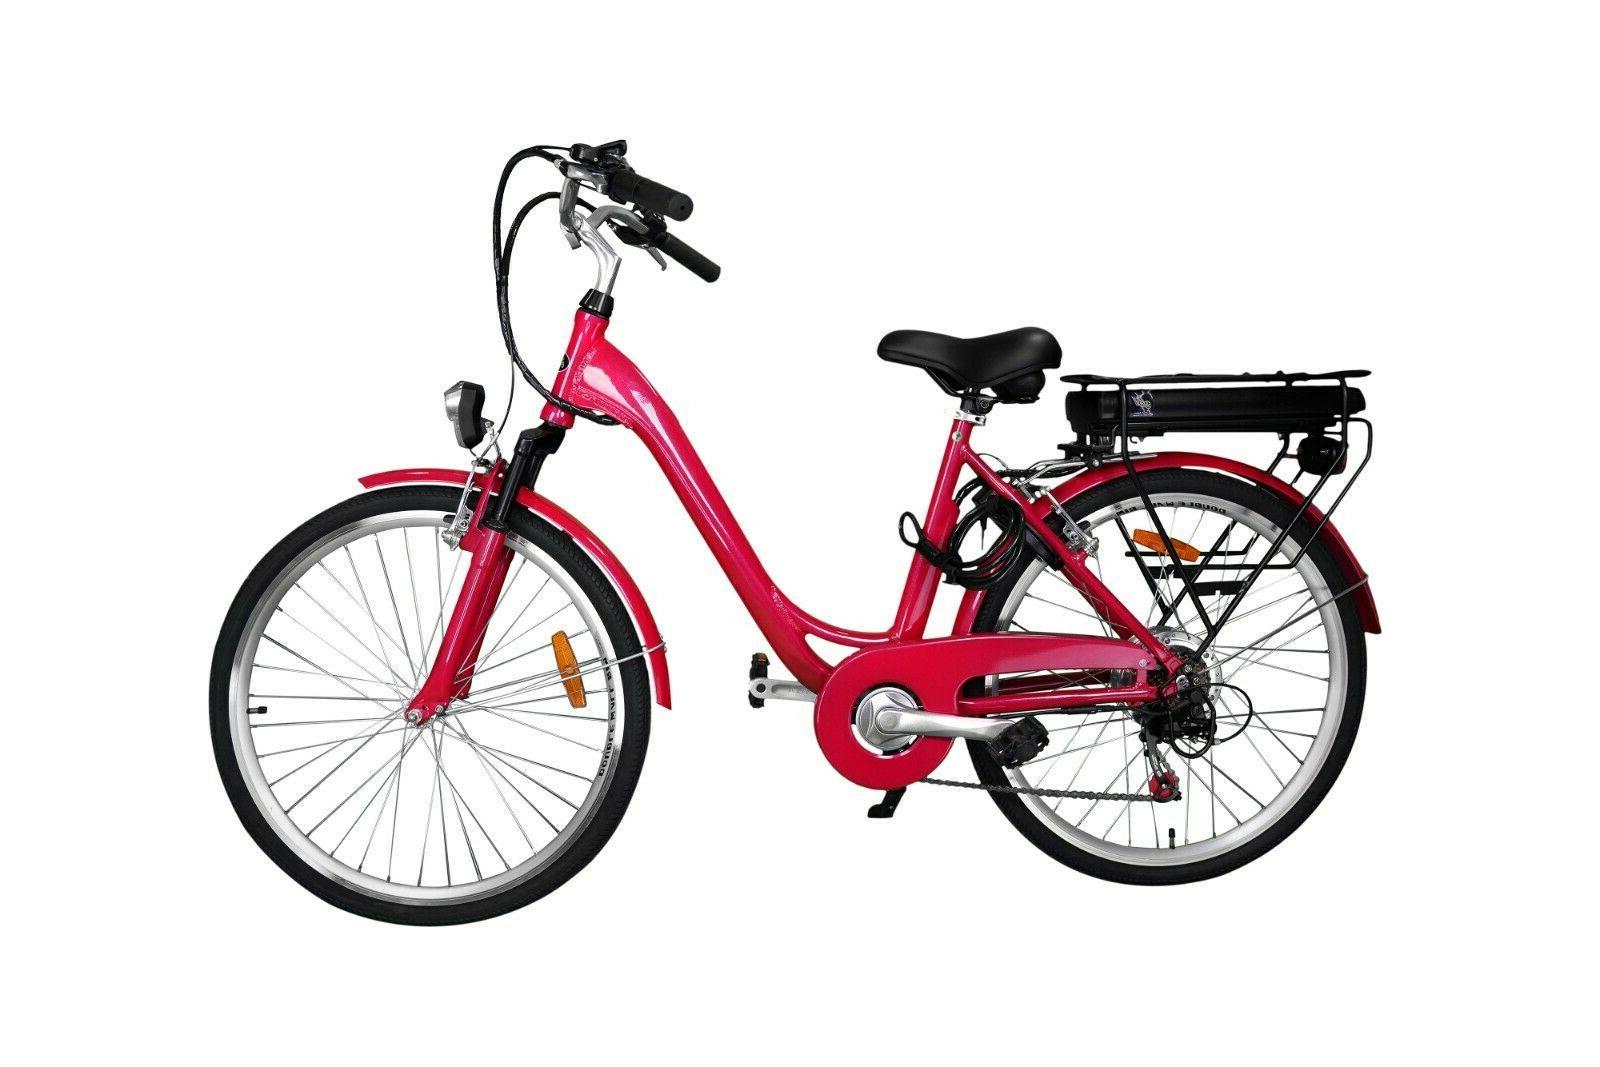 Brand New Metallic Pink 350W Bafang Motor